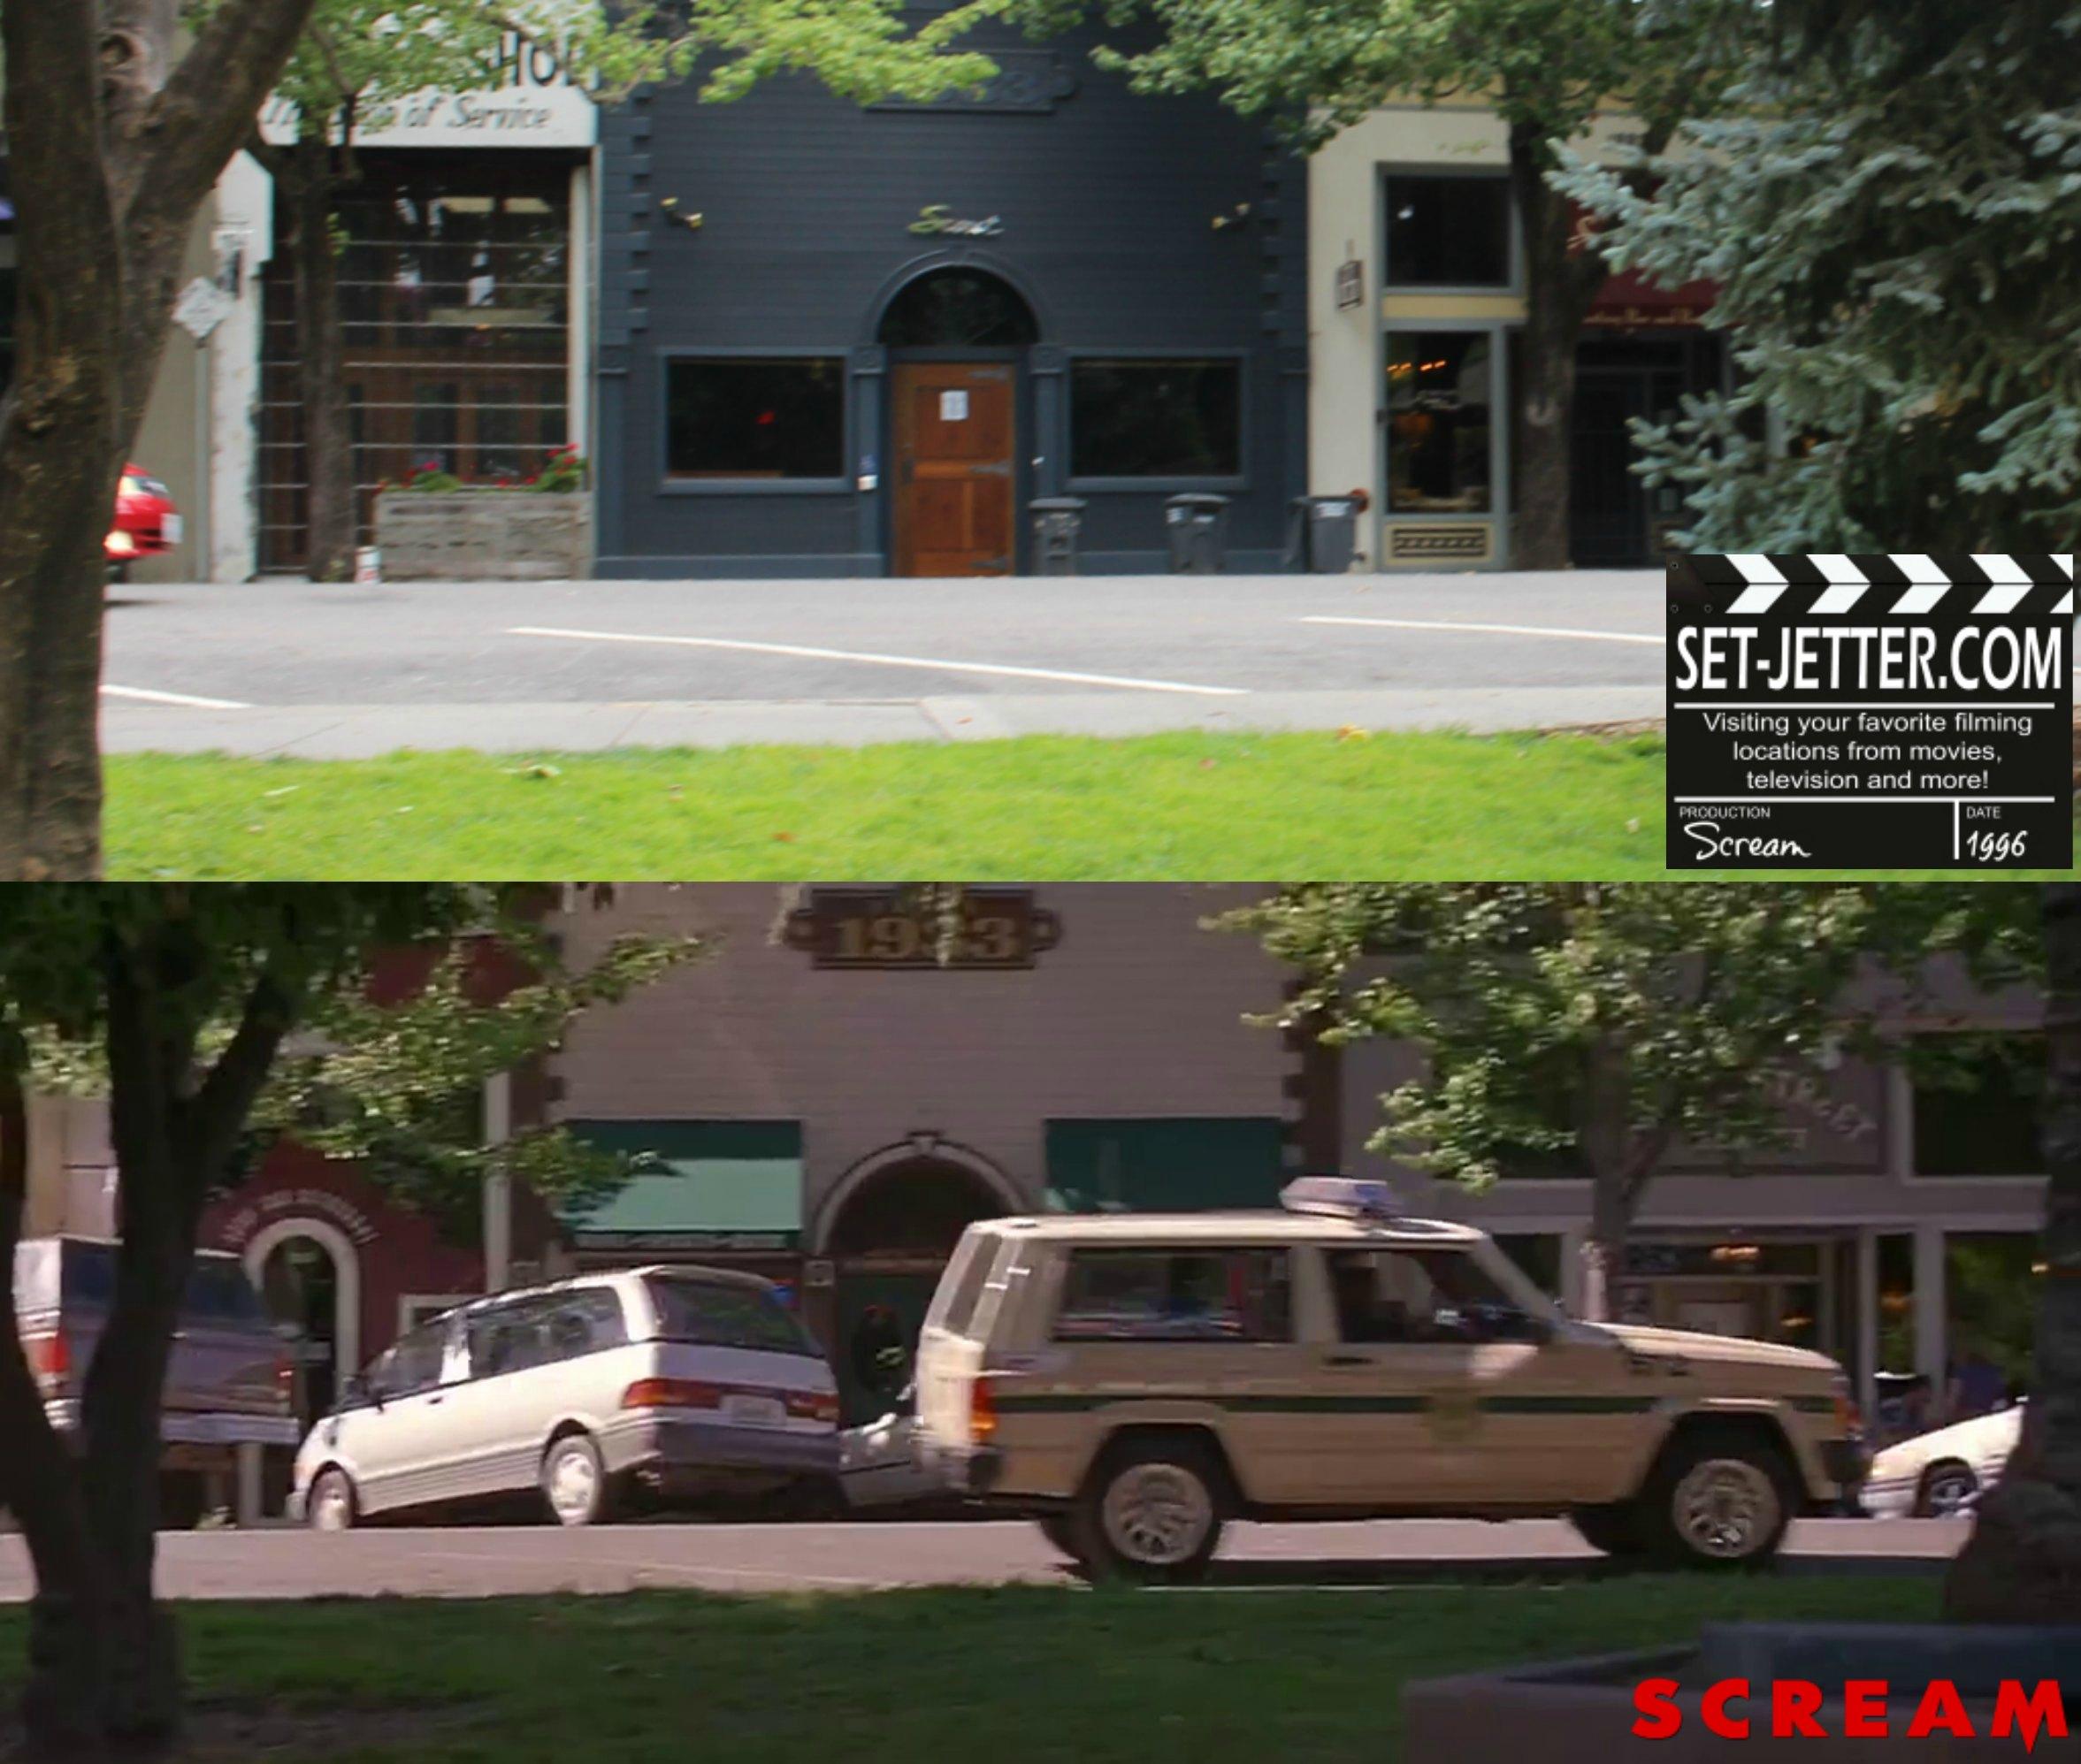 Scream comparison 193.jpg